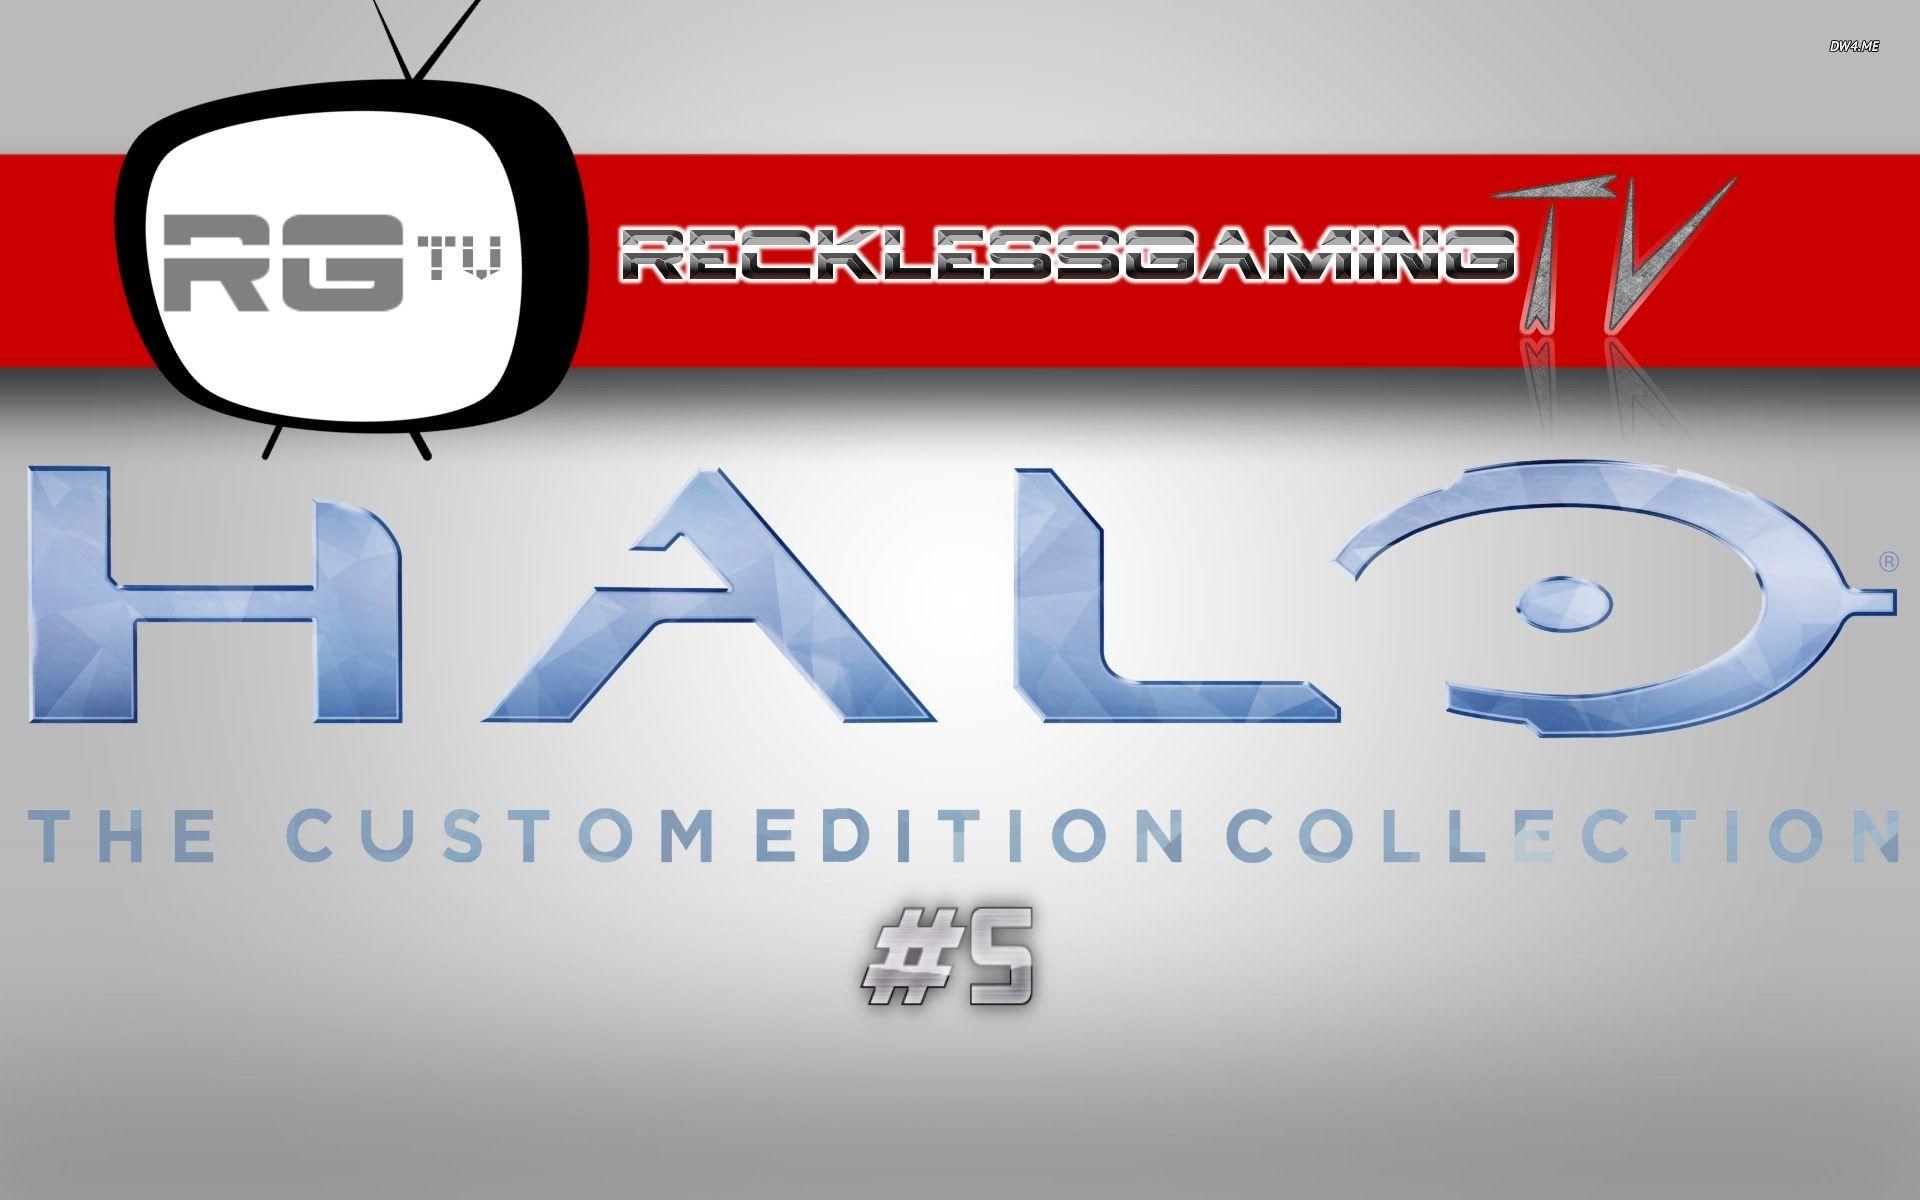 Halo CE Rebooted 5 Halo ce, Company logo, Tech company